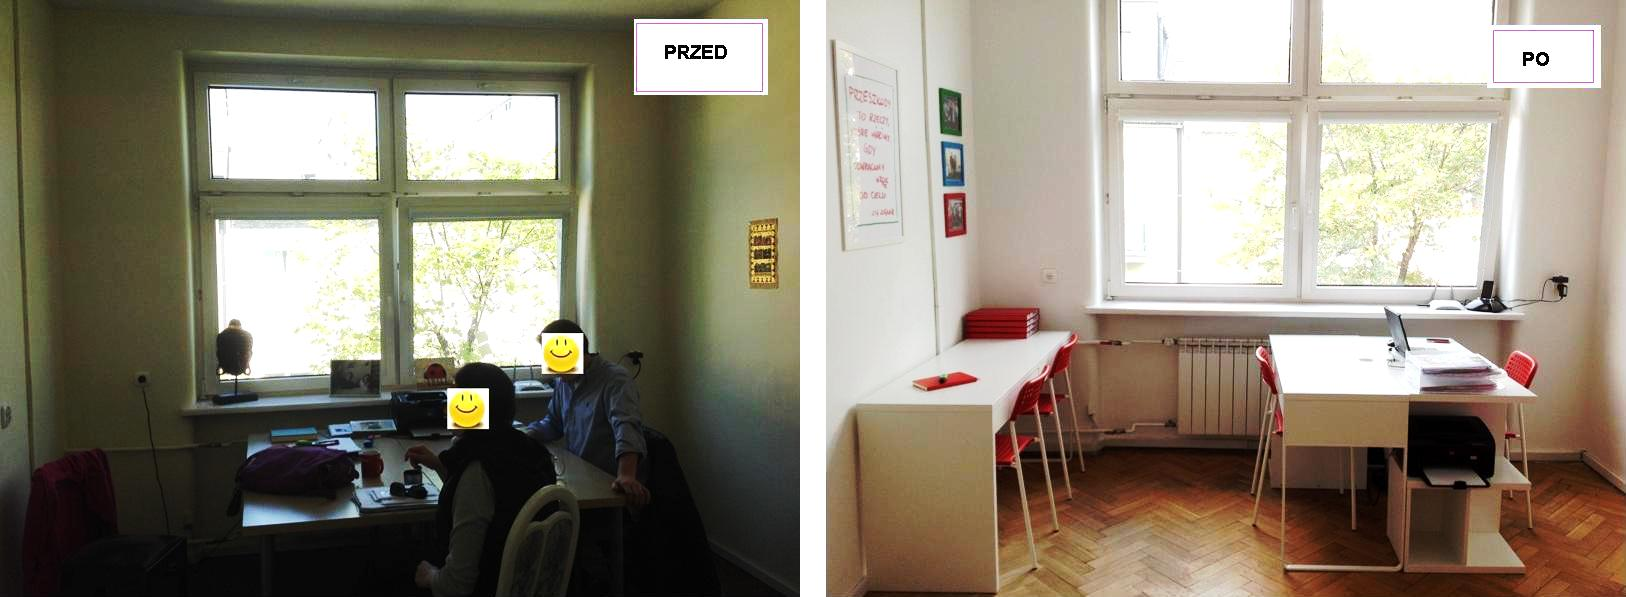 4 projekt wnetrza male kolorowe biuro interior design small colorful office google style forelementspl